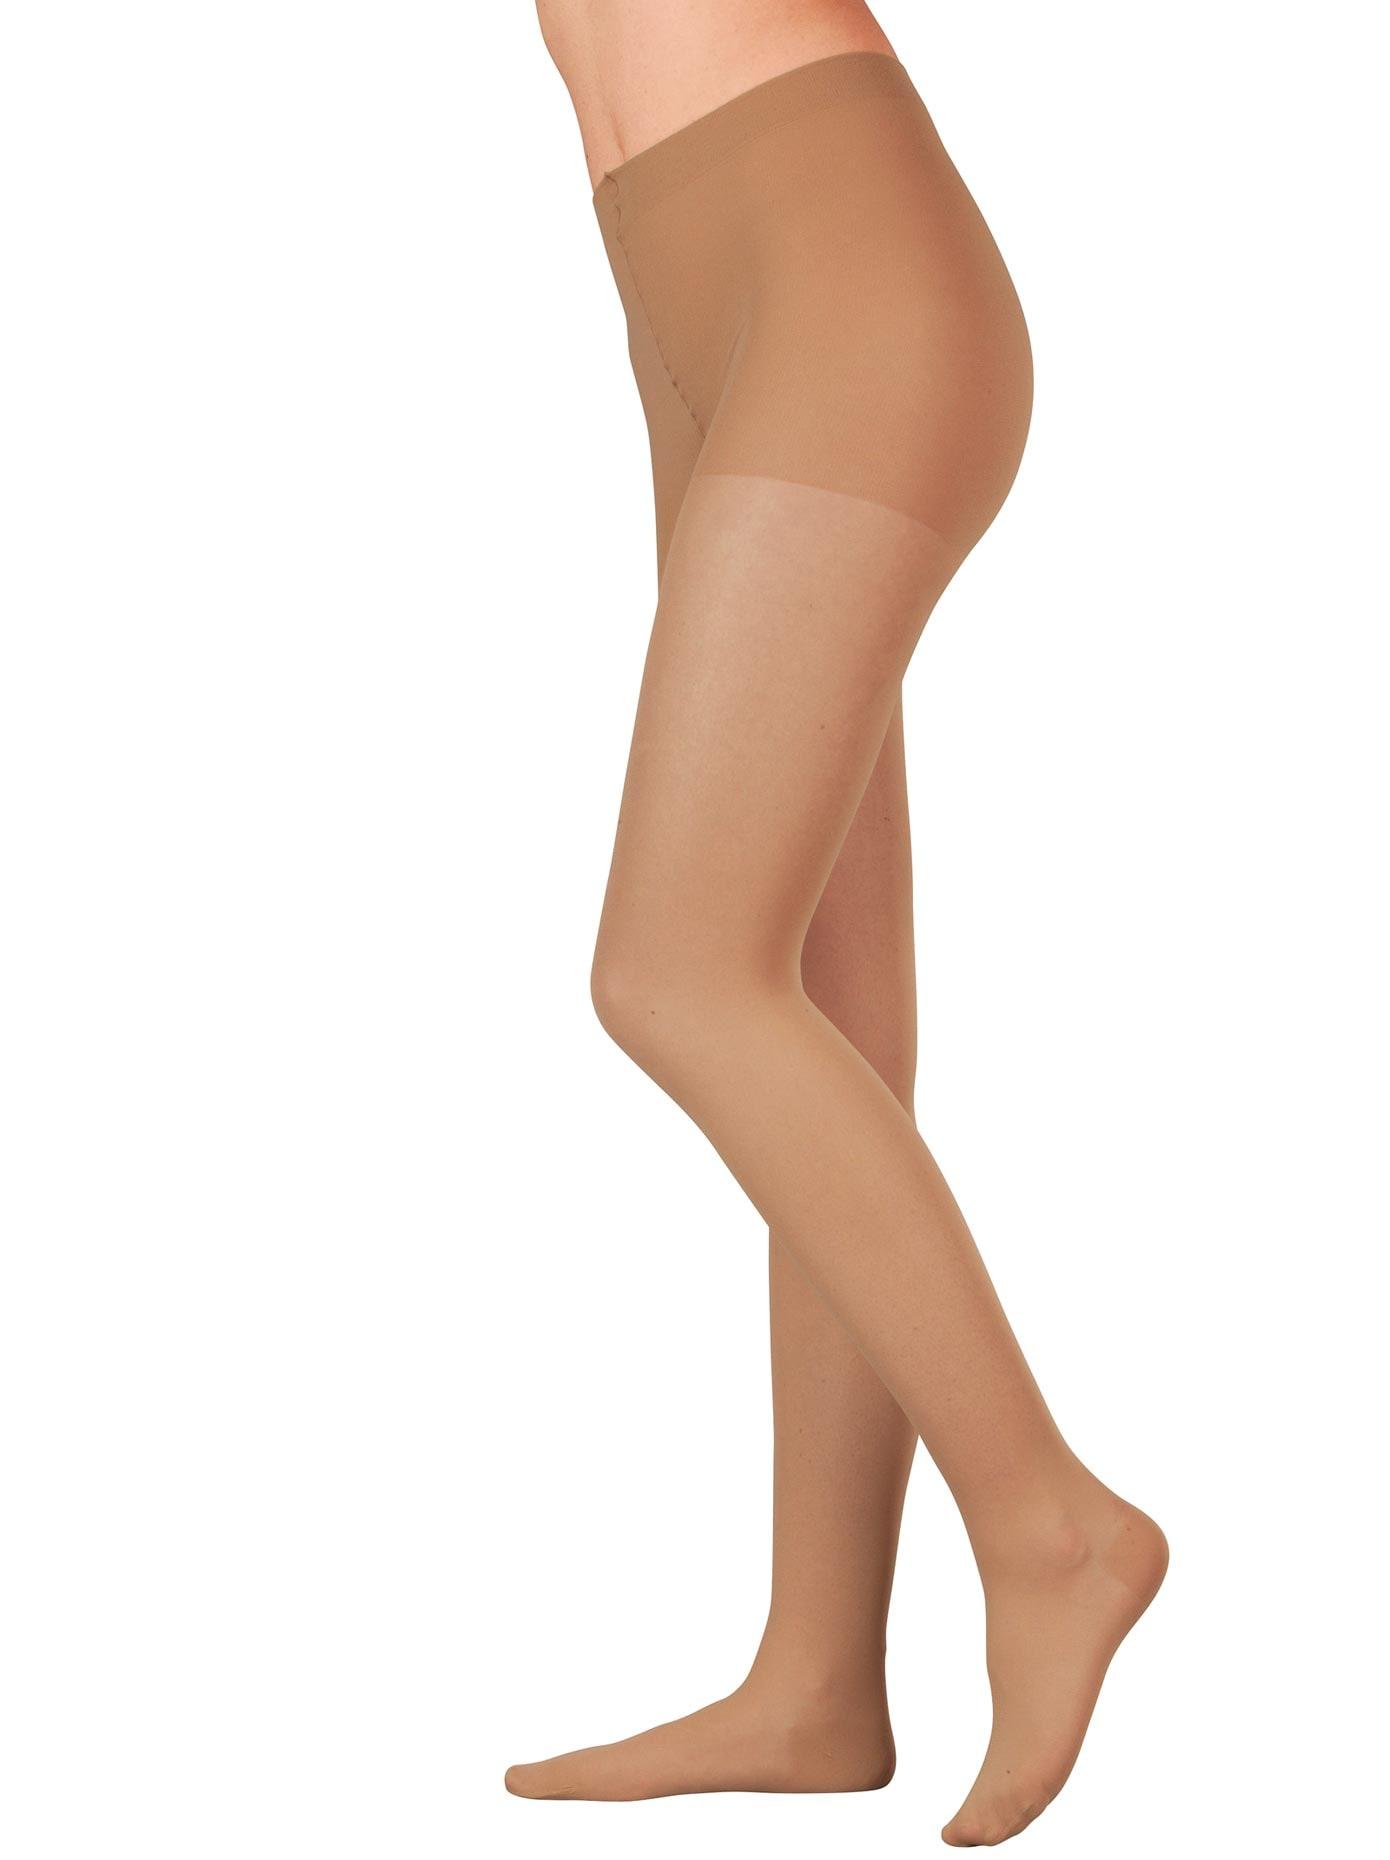 Esda Stützstrumpfhose 40den 3 Paar | Unterwäsche & Reizwäsche > Strumpfhosen > Stützstrumpfhosen | Esda